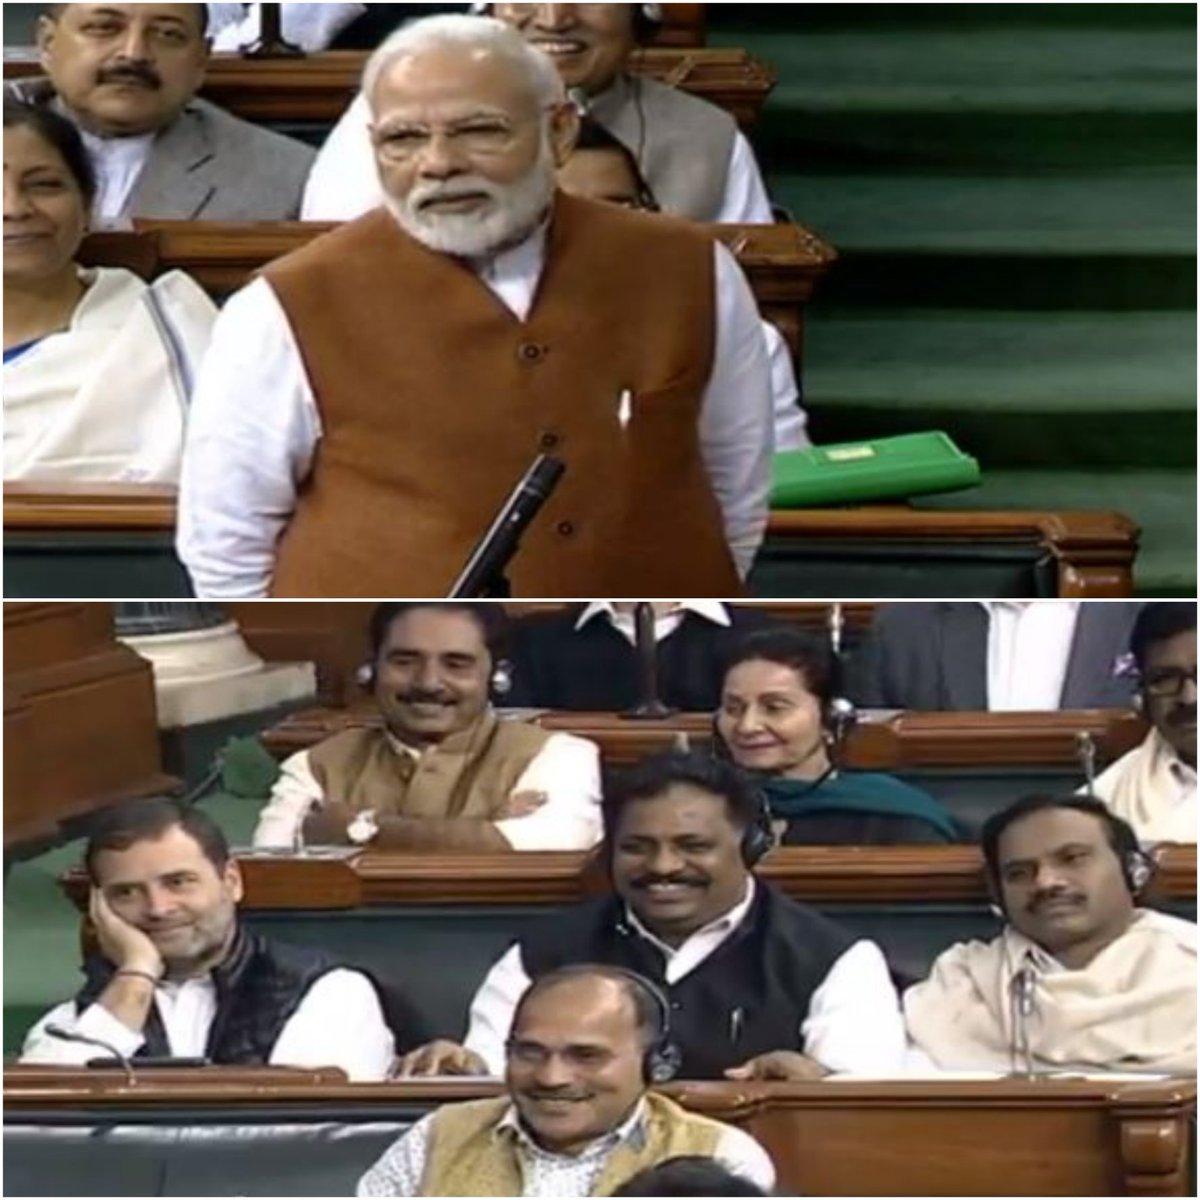 Pic(k) of the day  RT with your own captions!  #India #LokSabha #PrimeMinister #NarendraModi #Namo #BJP #Congress #RahulGandhi #IndiaPolitics pic.twitter.com/A1XO4mXqSz